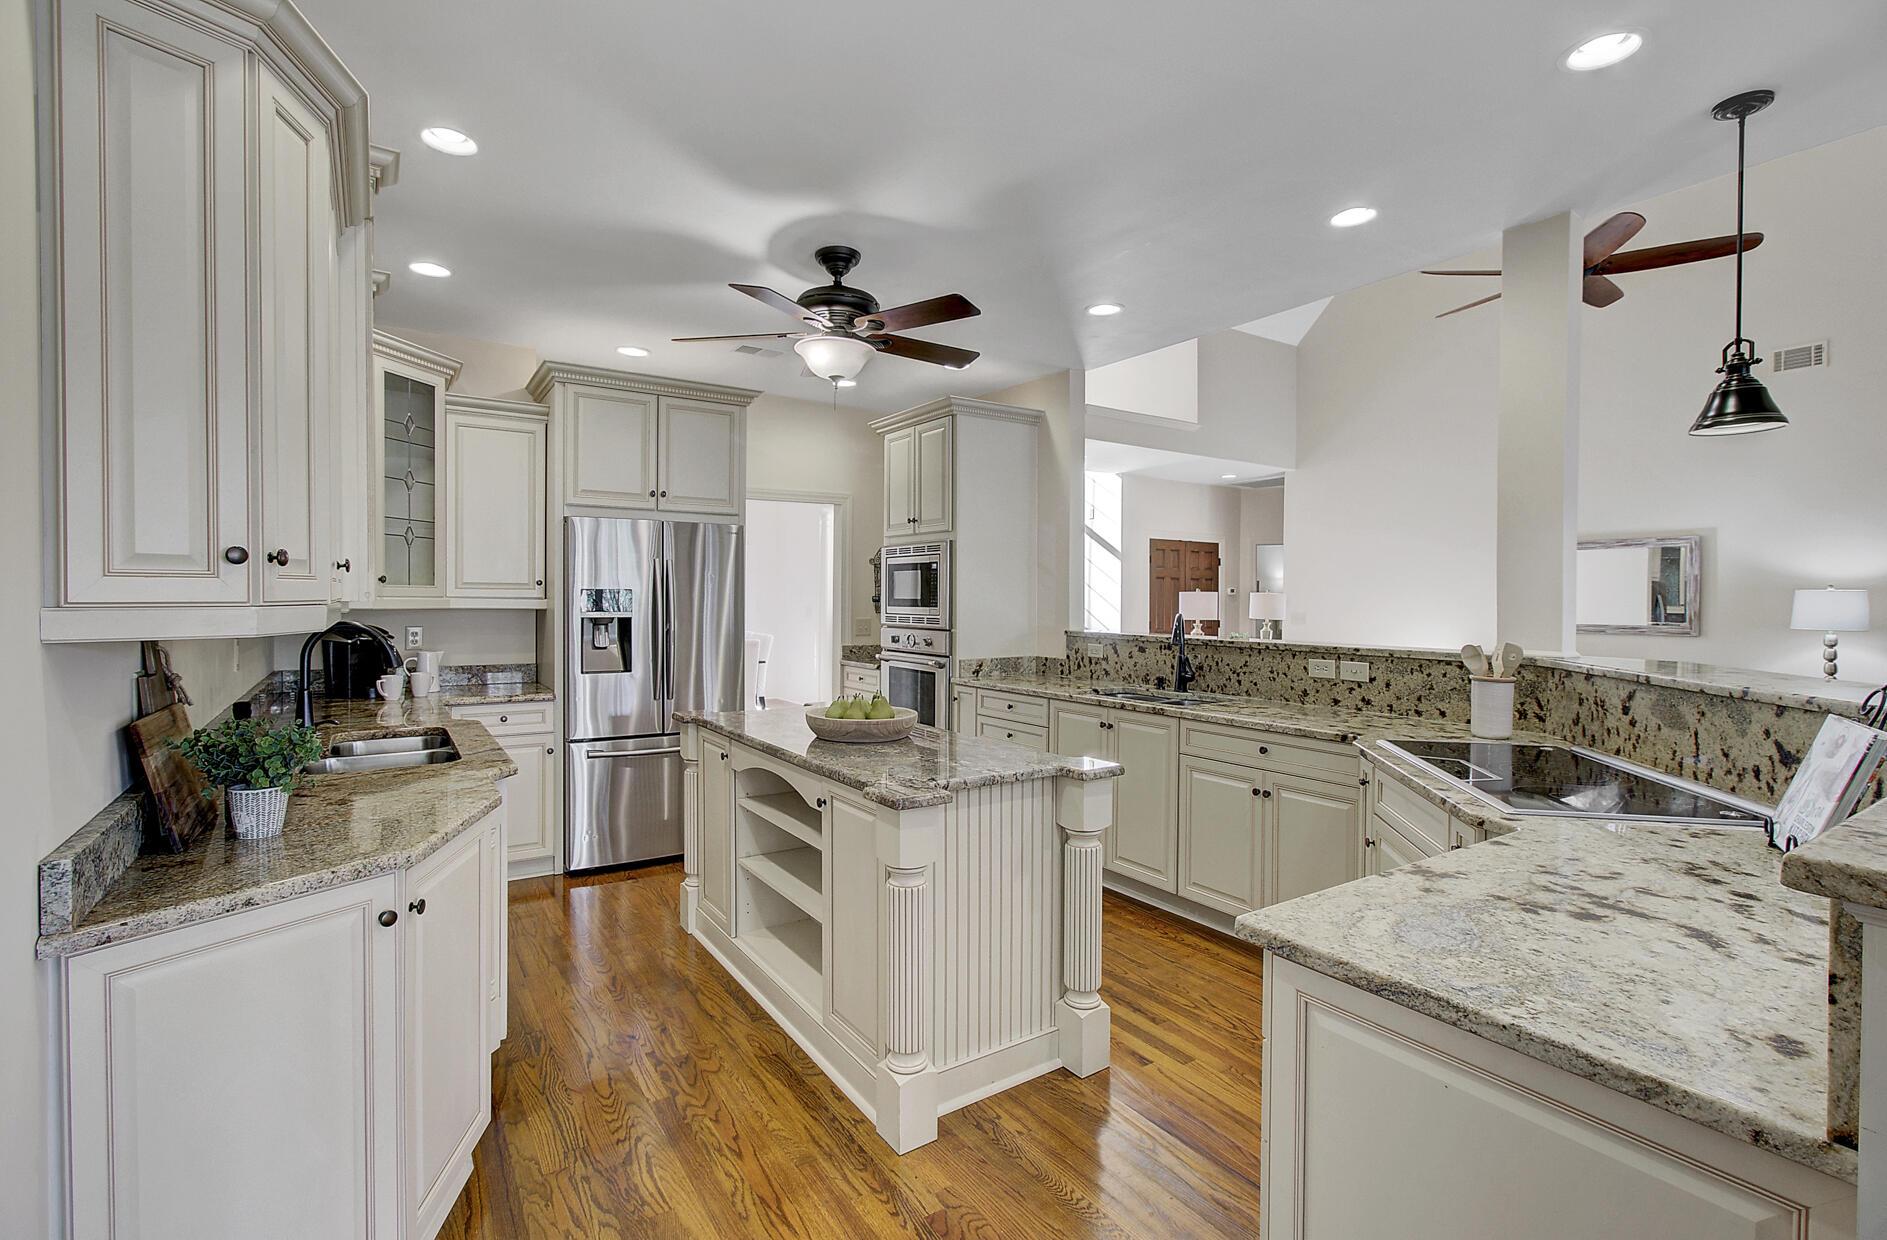 Dunes West Homes For Sale - 4123 Colonel Vanderhorst, Mount Pleasant, SC - 18